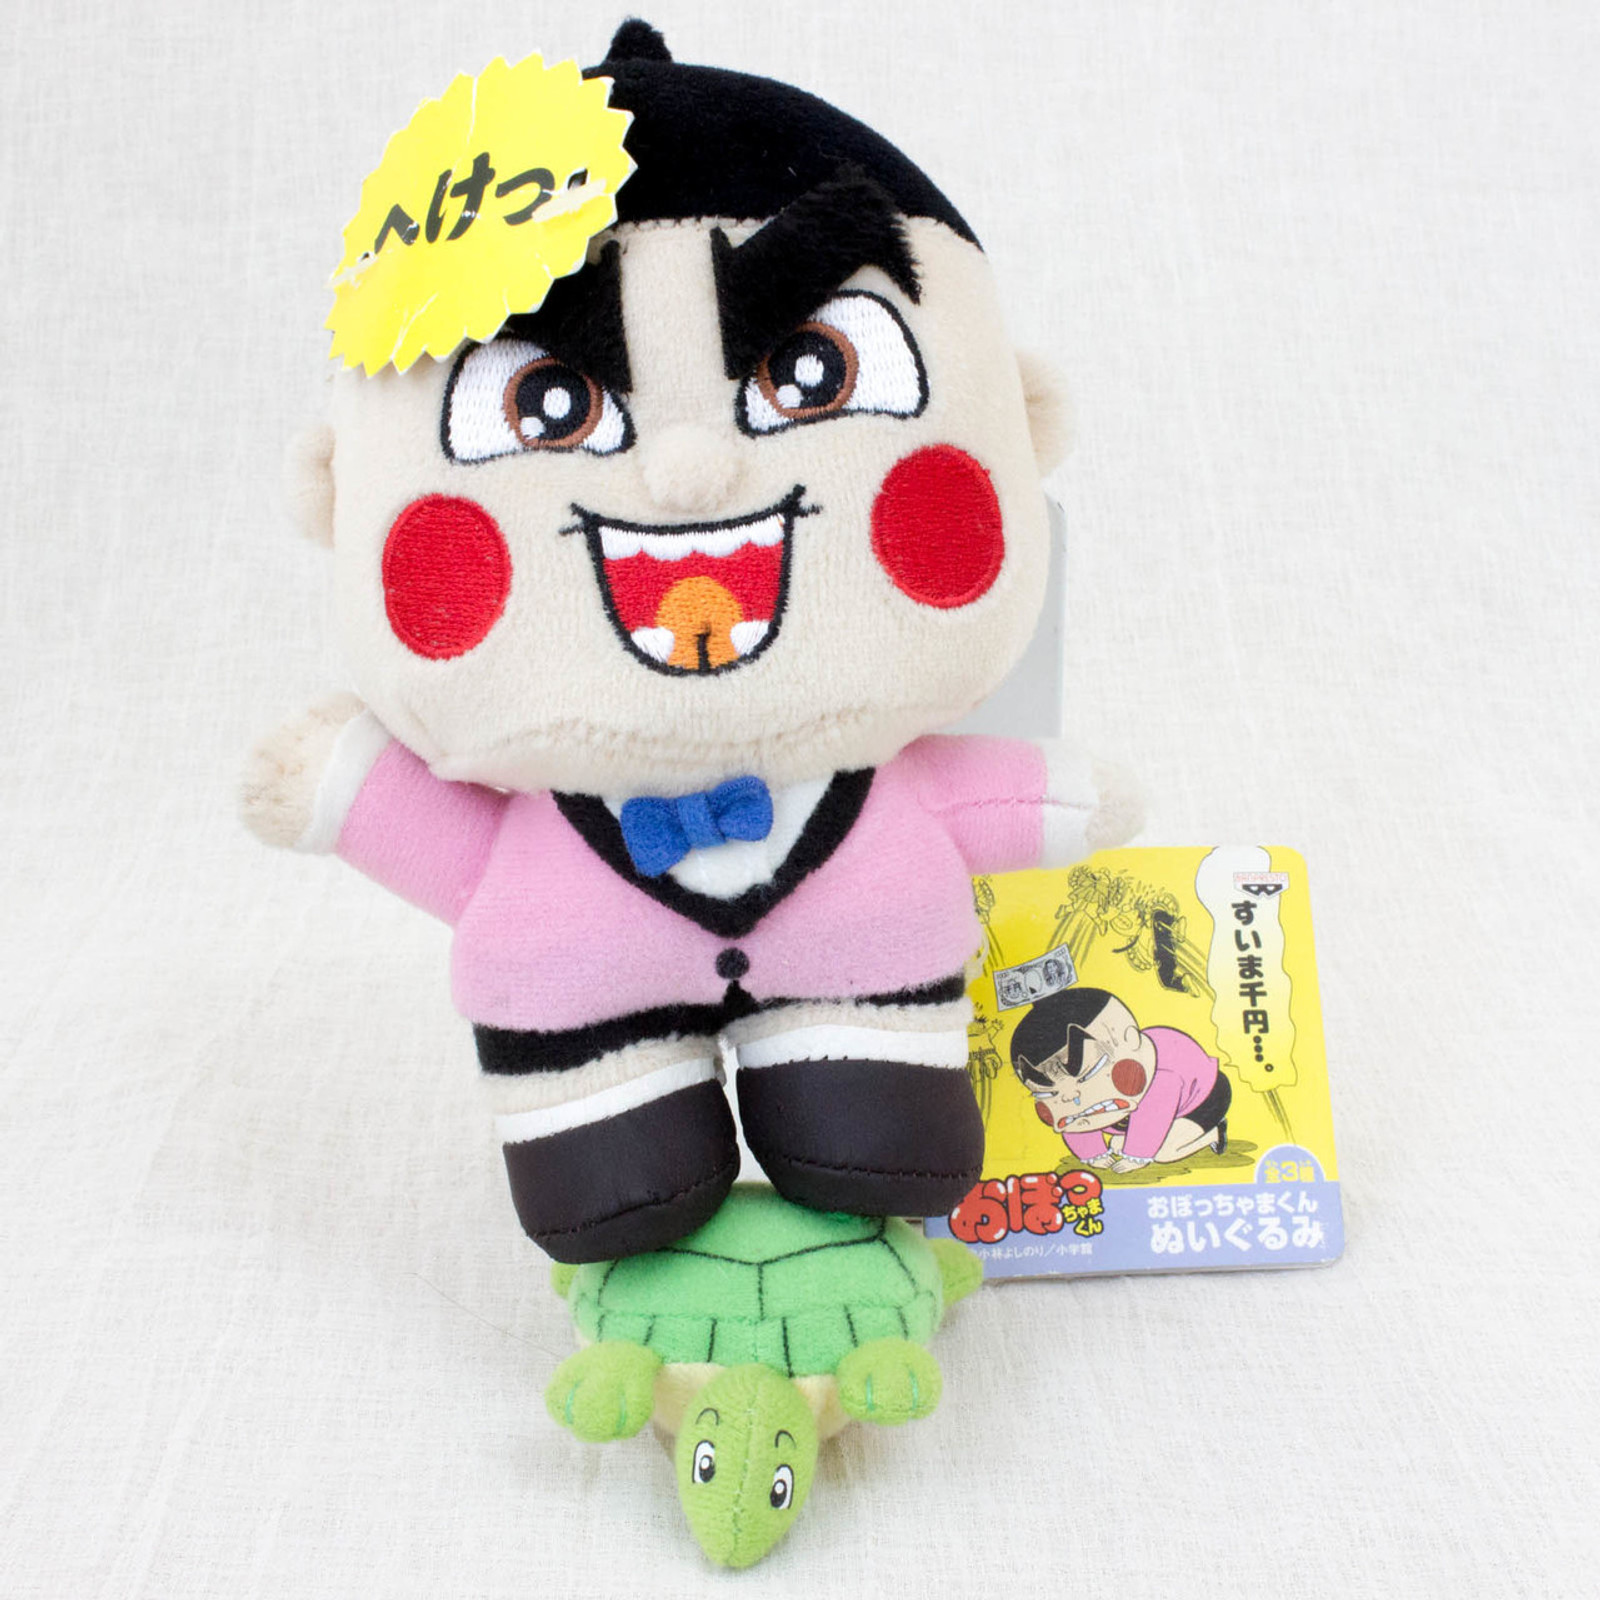 Obocchama kun Mini Plush Doll Yoshinori Kobayashi KoroKoro Comics JAPAN ANIME